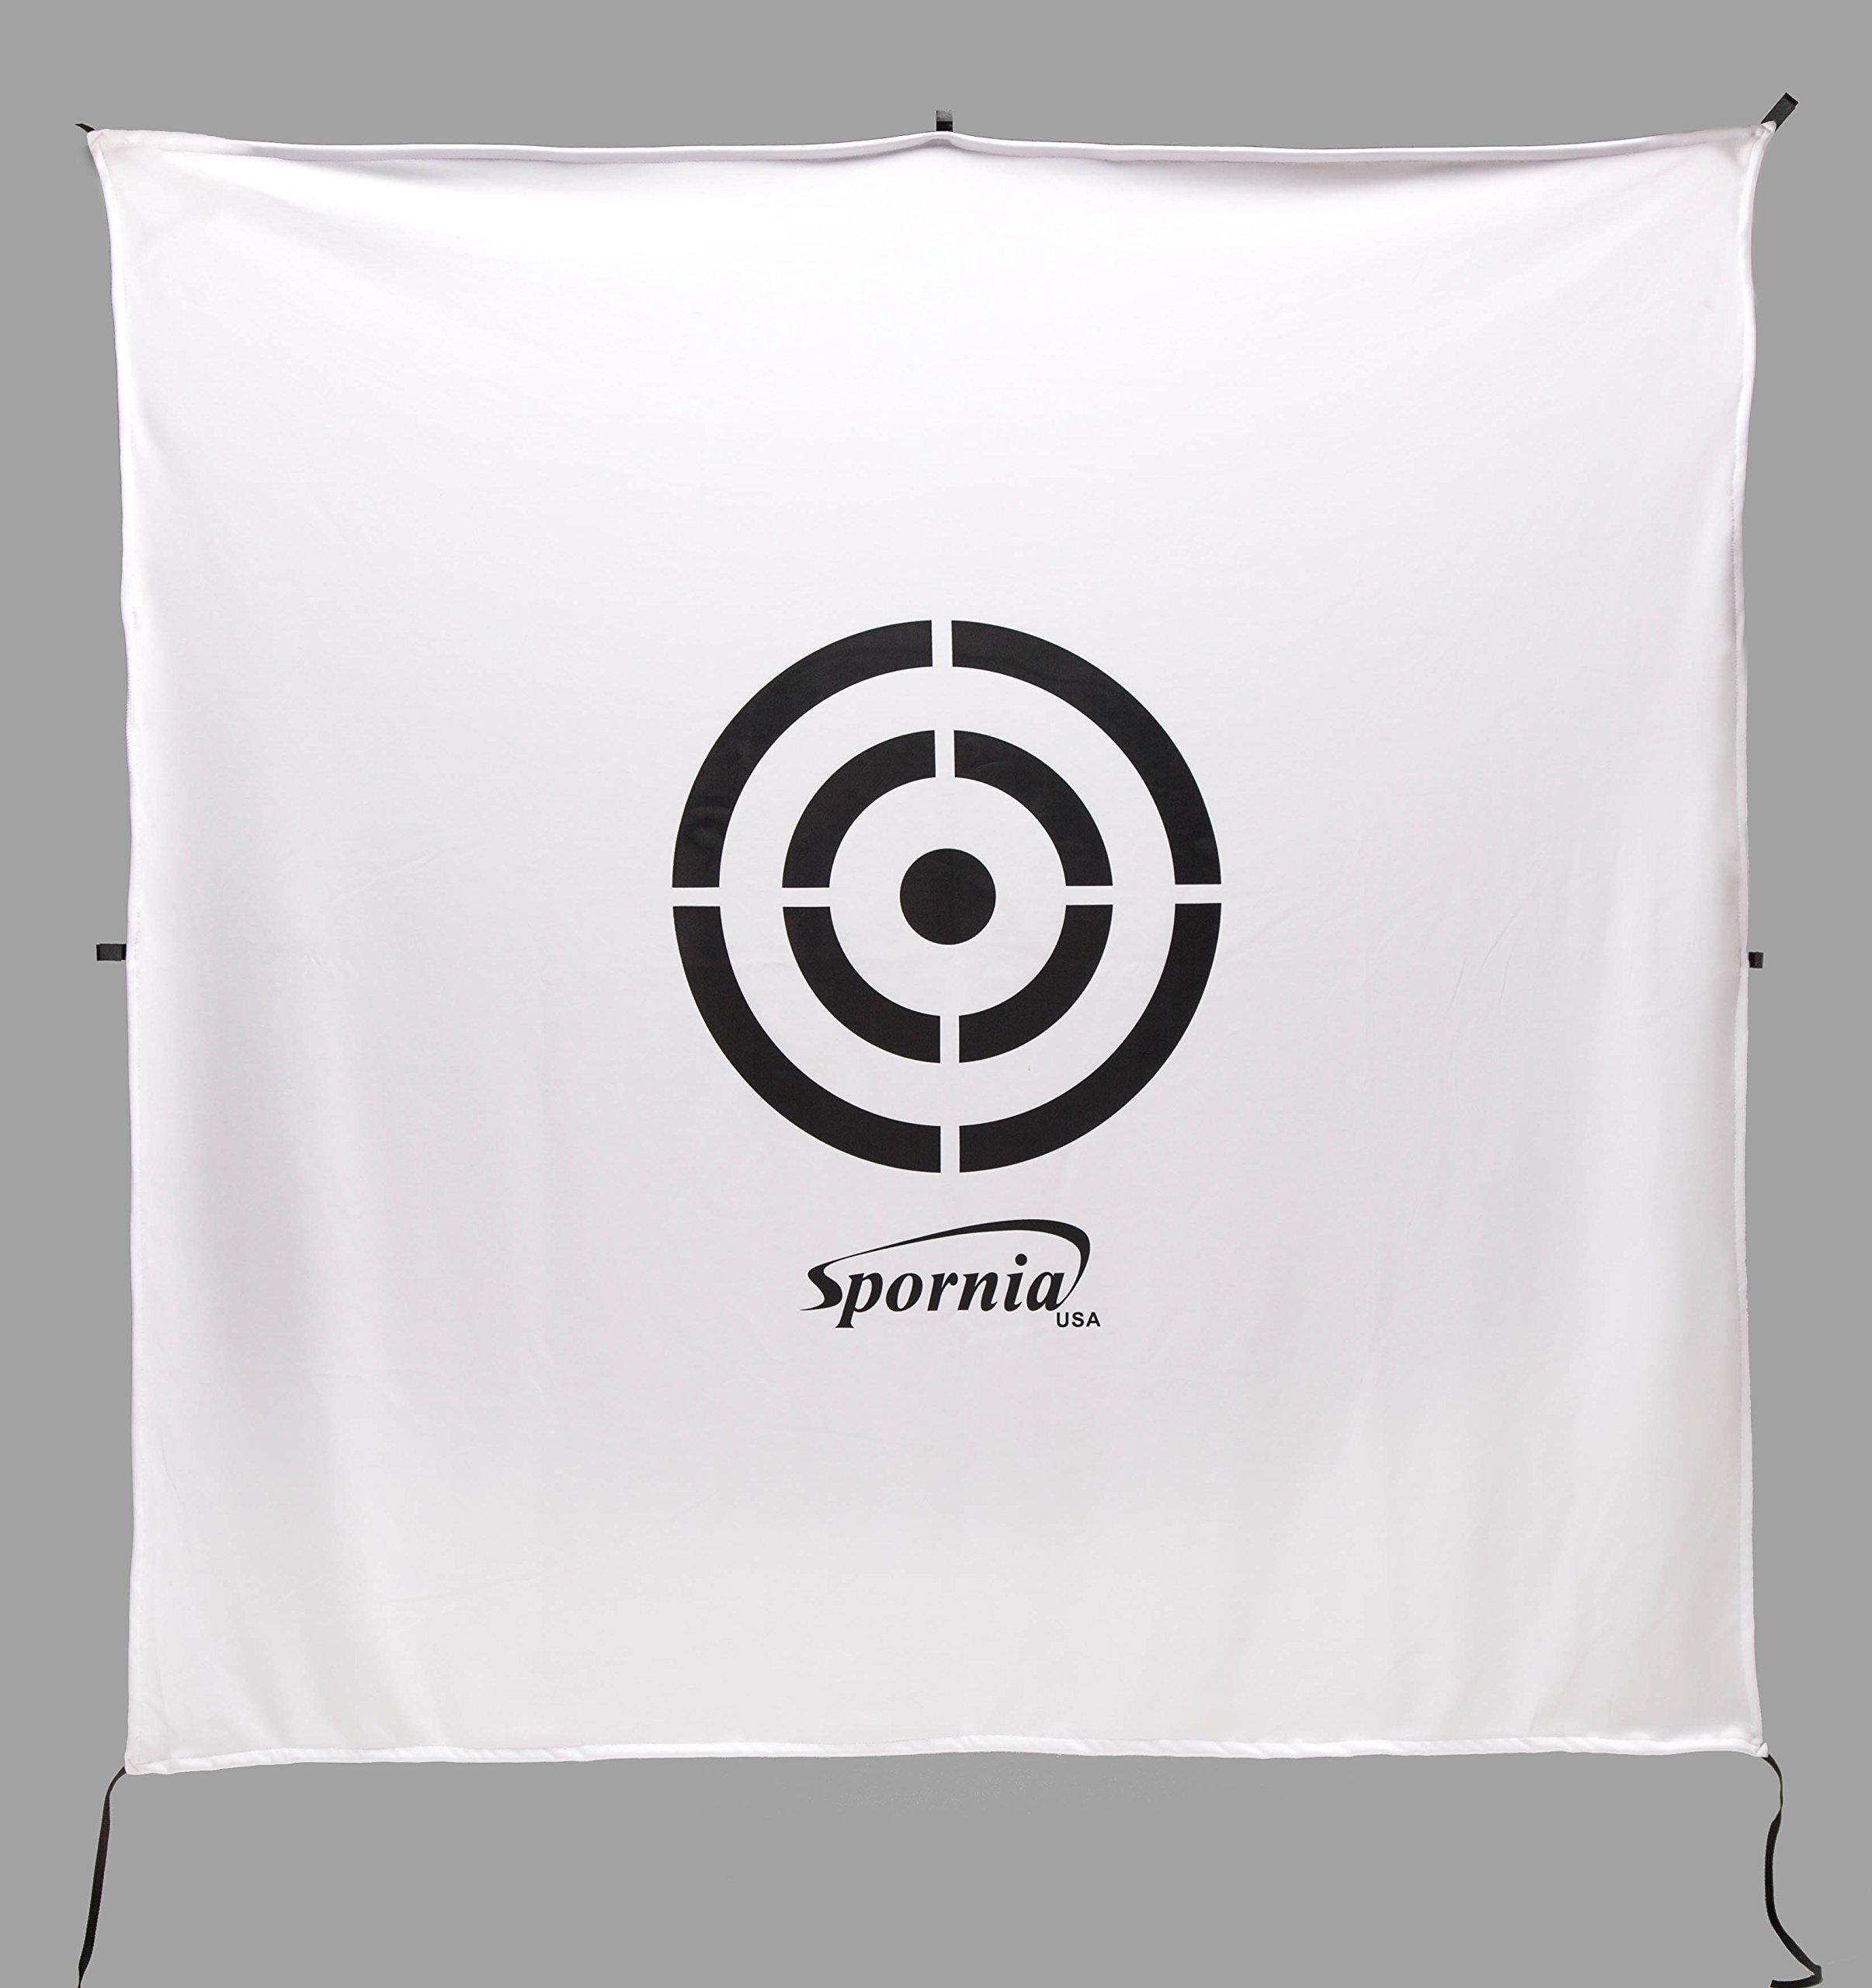 Spornia Golf Net Target (6' x 6') | Golf Simulator Screen | Circle Backstop Target | 2 in 1 Reversible Screen | Indoor Home Training